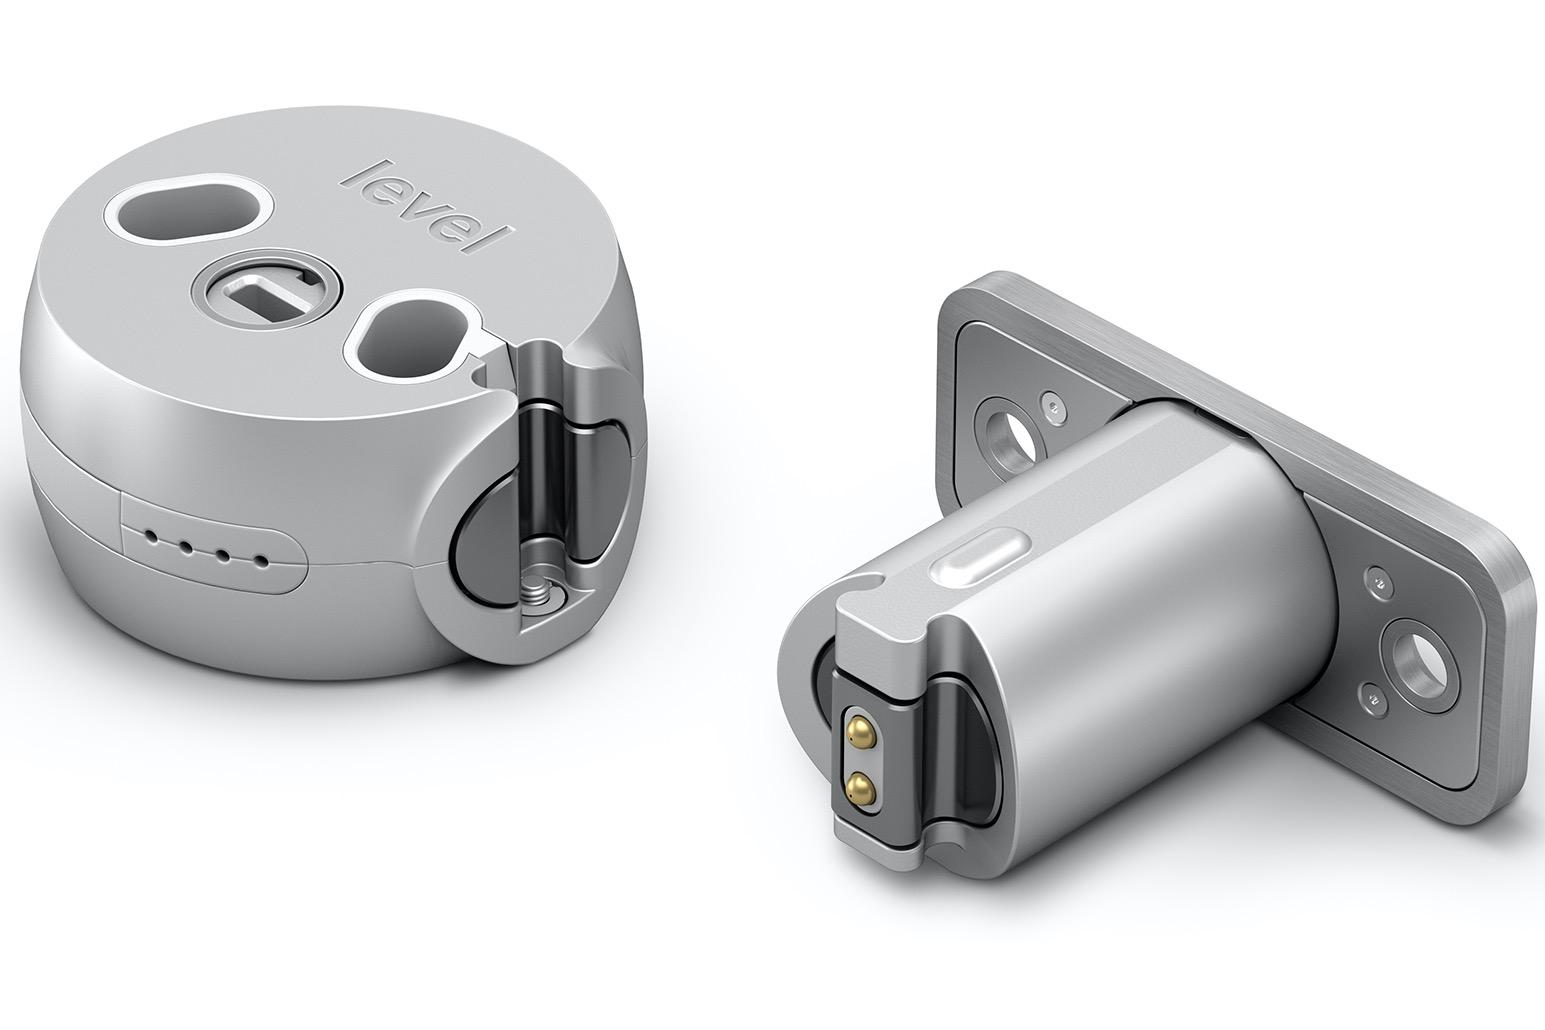 Stealthy retrofit smart lock hides inside the door